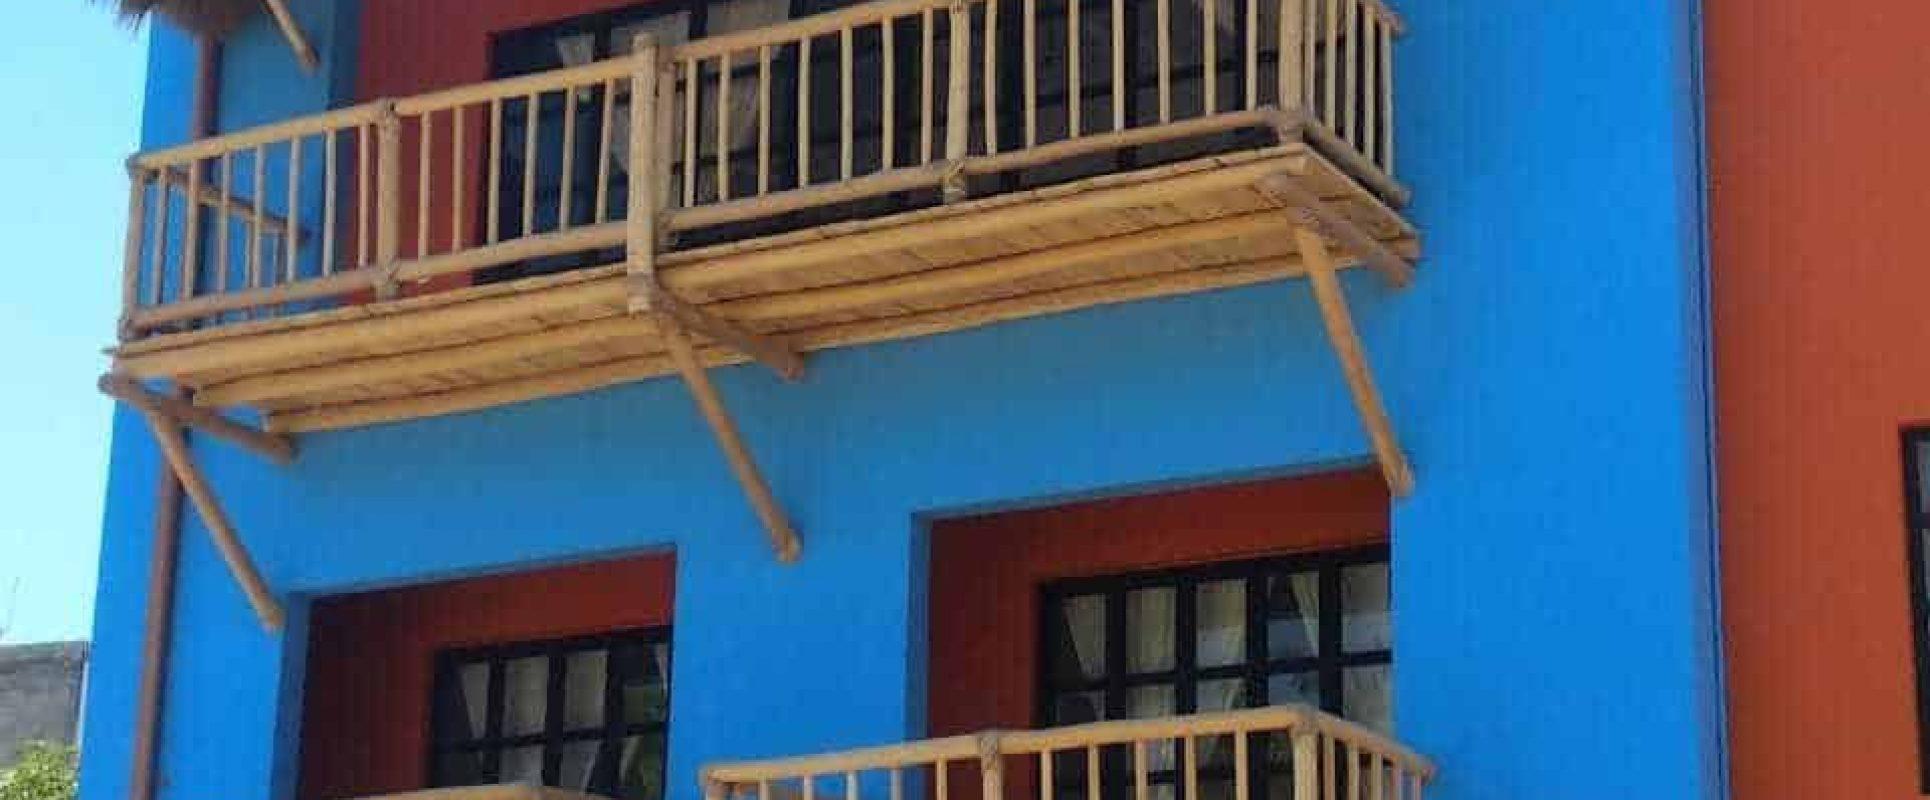 Hummingbird House Photo